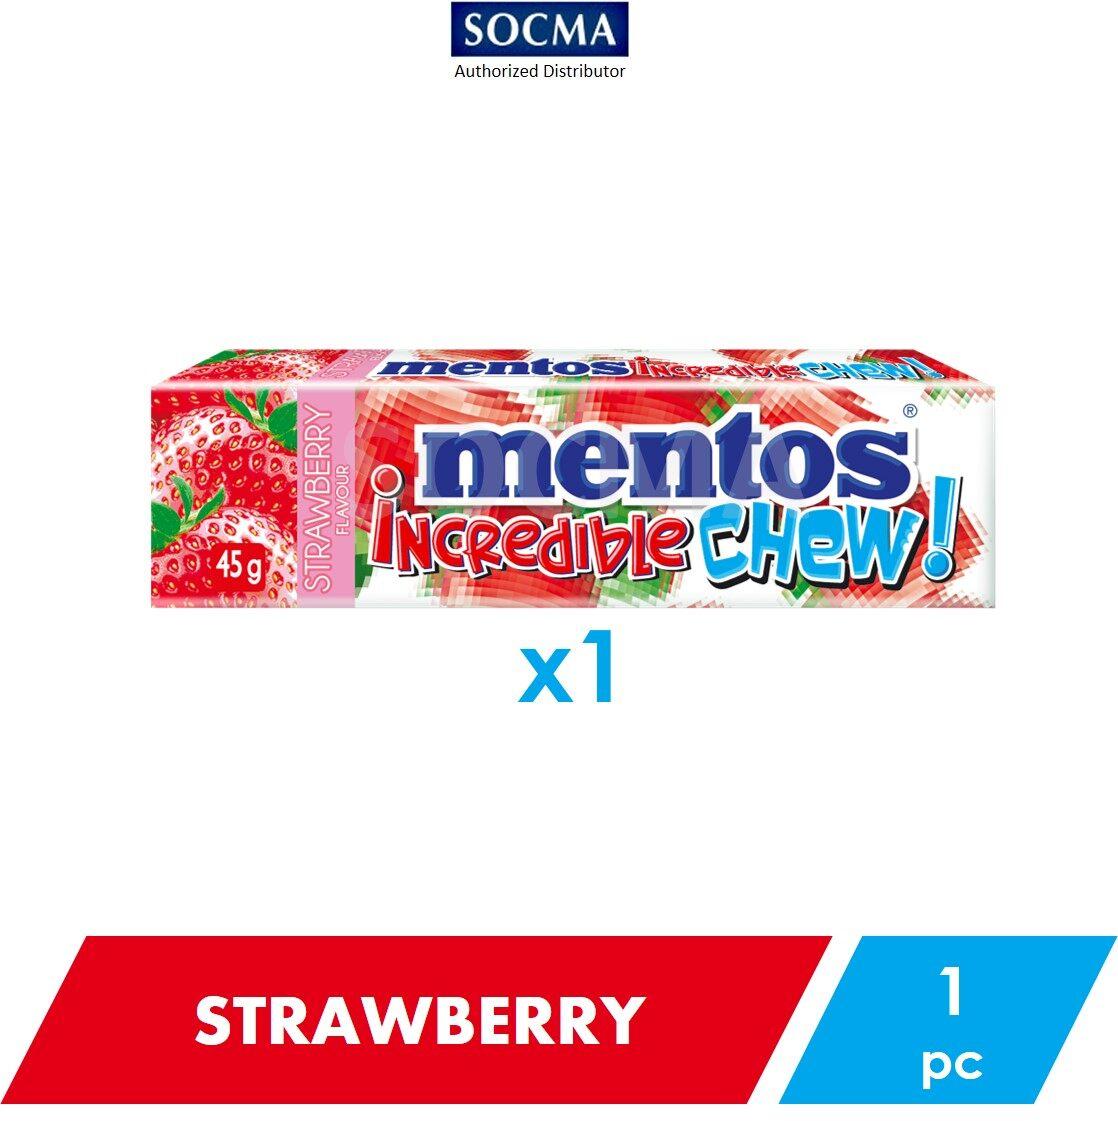 Mentos Incredible Chew Strawberry 45g [1]